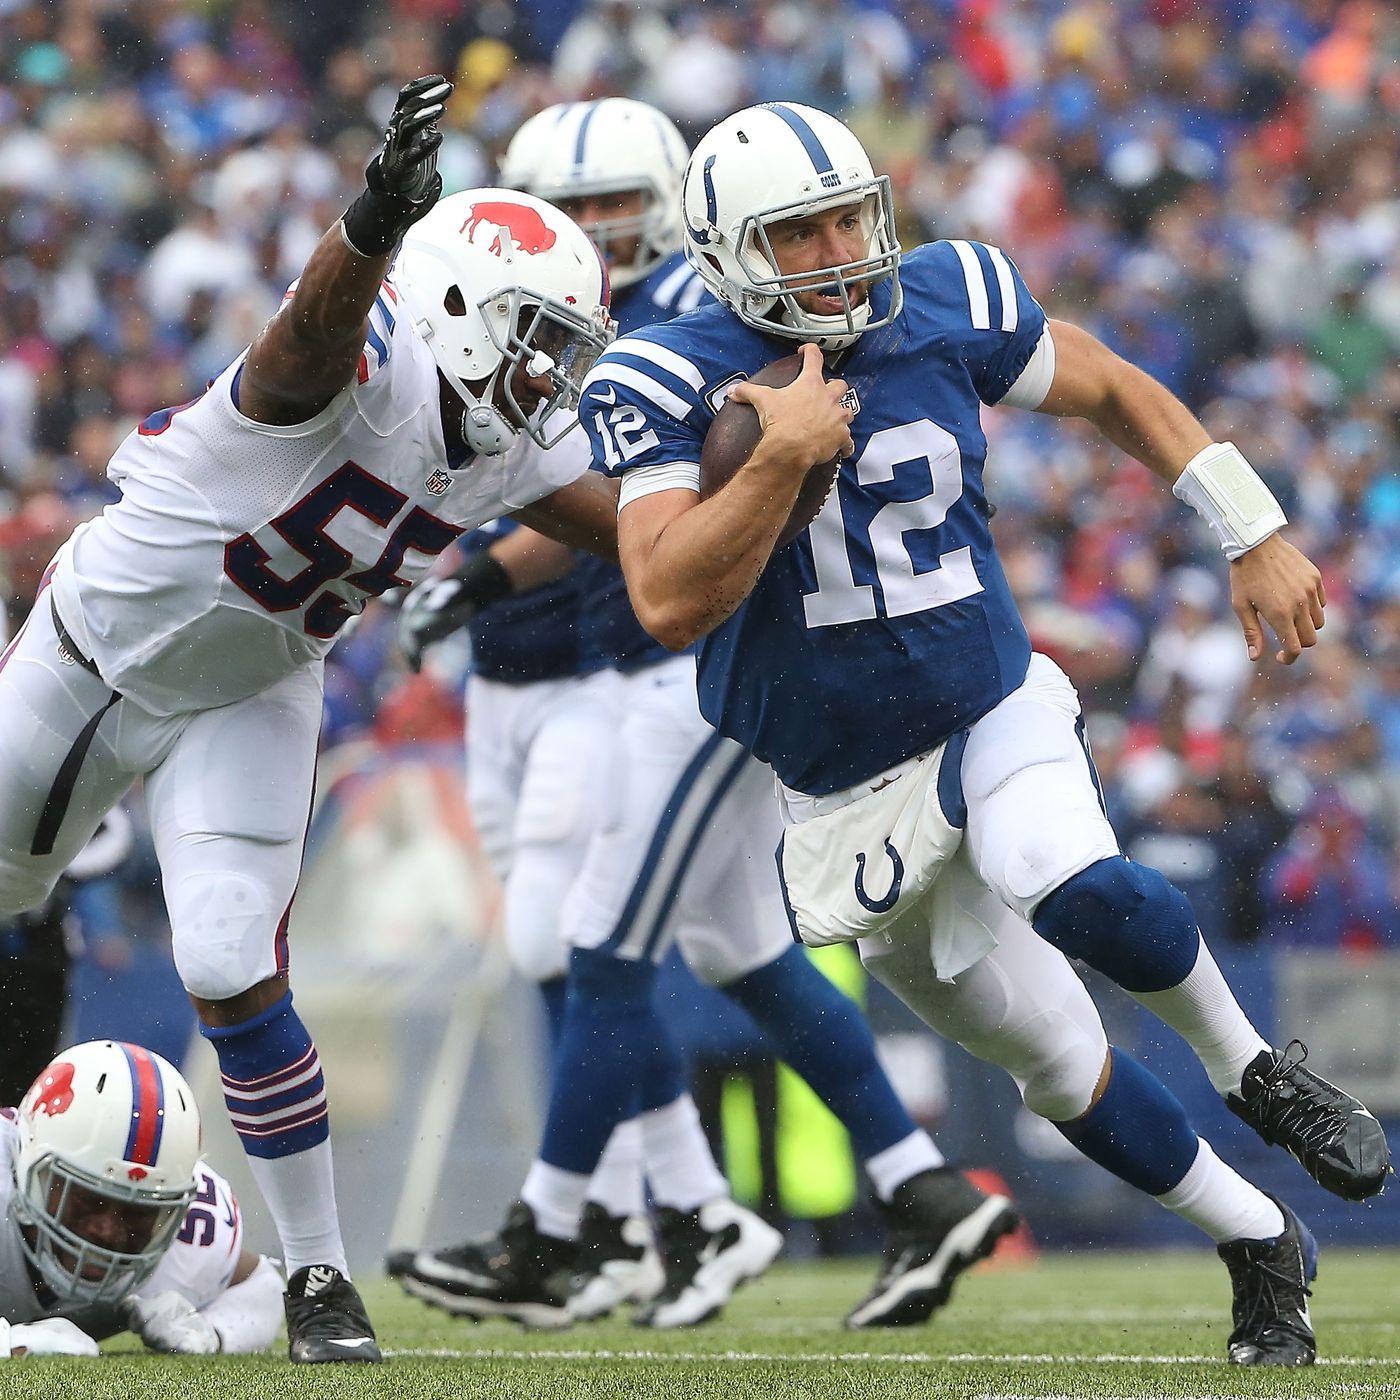 Indianapolis Colts Vs Buffalo Bills 2018 Week 7 Game Hub Stampede Blue